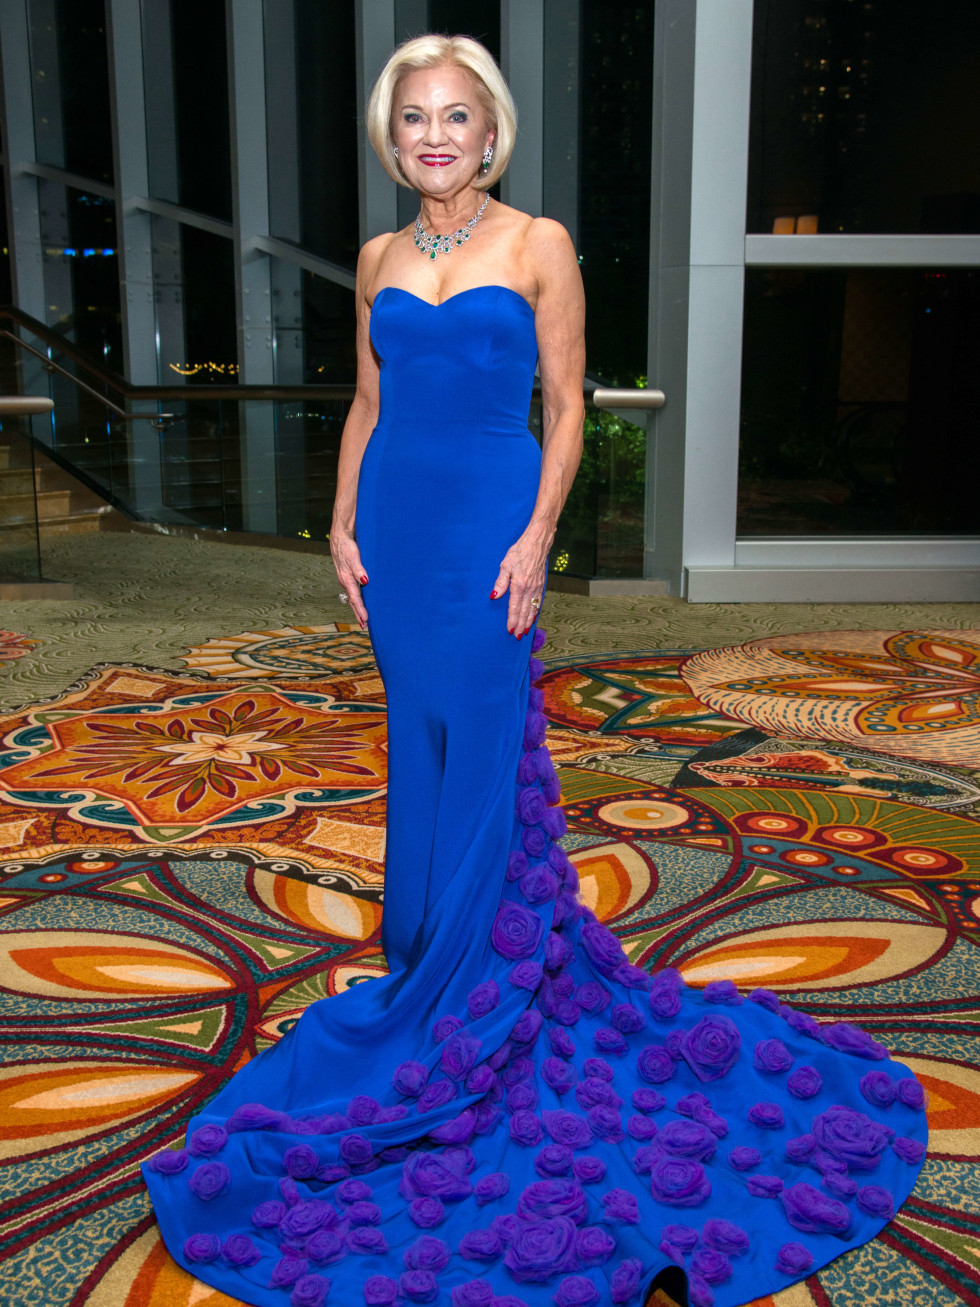 Houston, Women of Distinction fashionable gowns, Feb 2017, Jo Furr